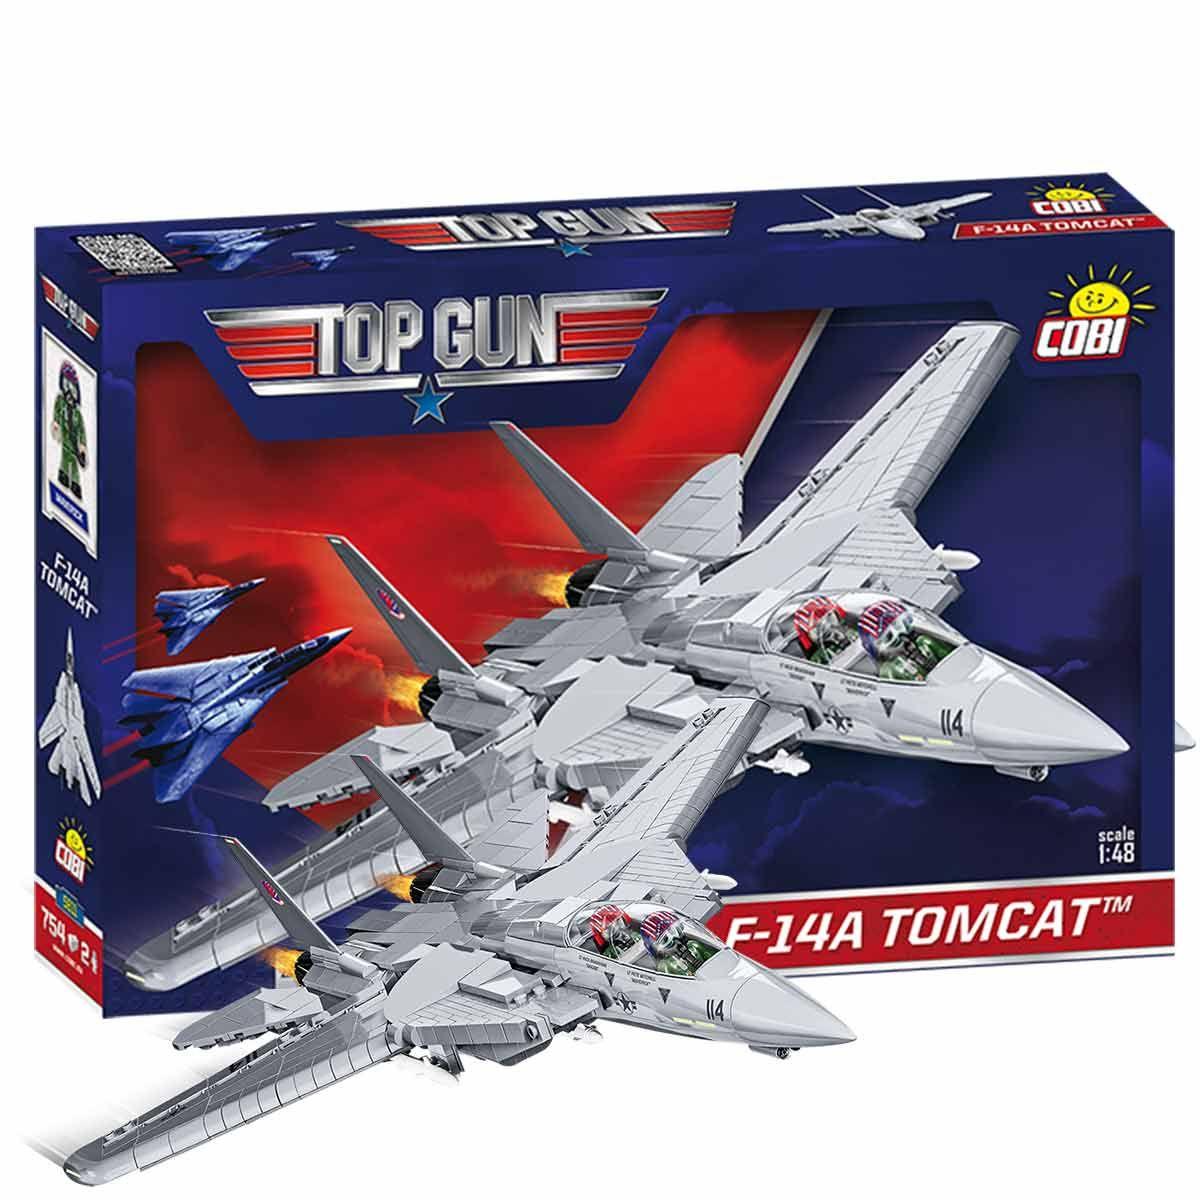 Top Gun F-14 Tomcat - 756 deler